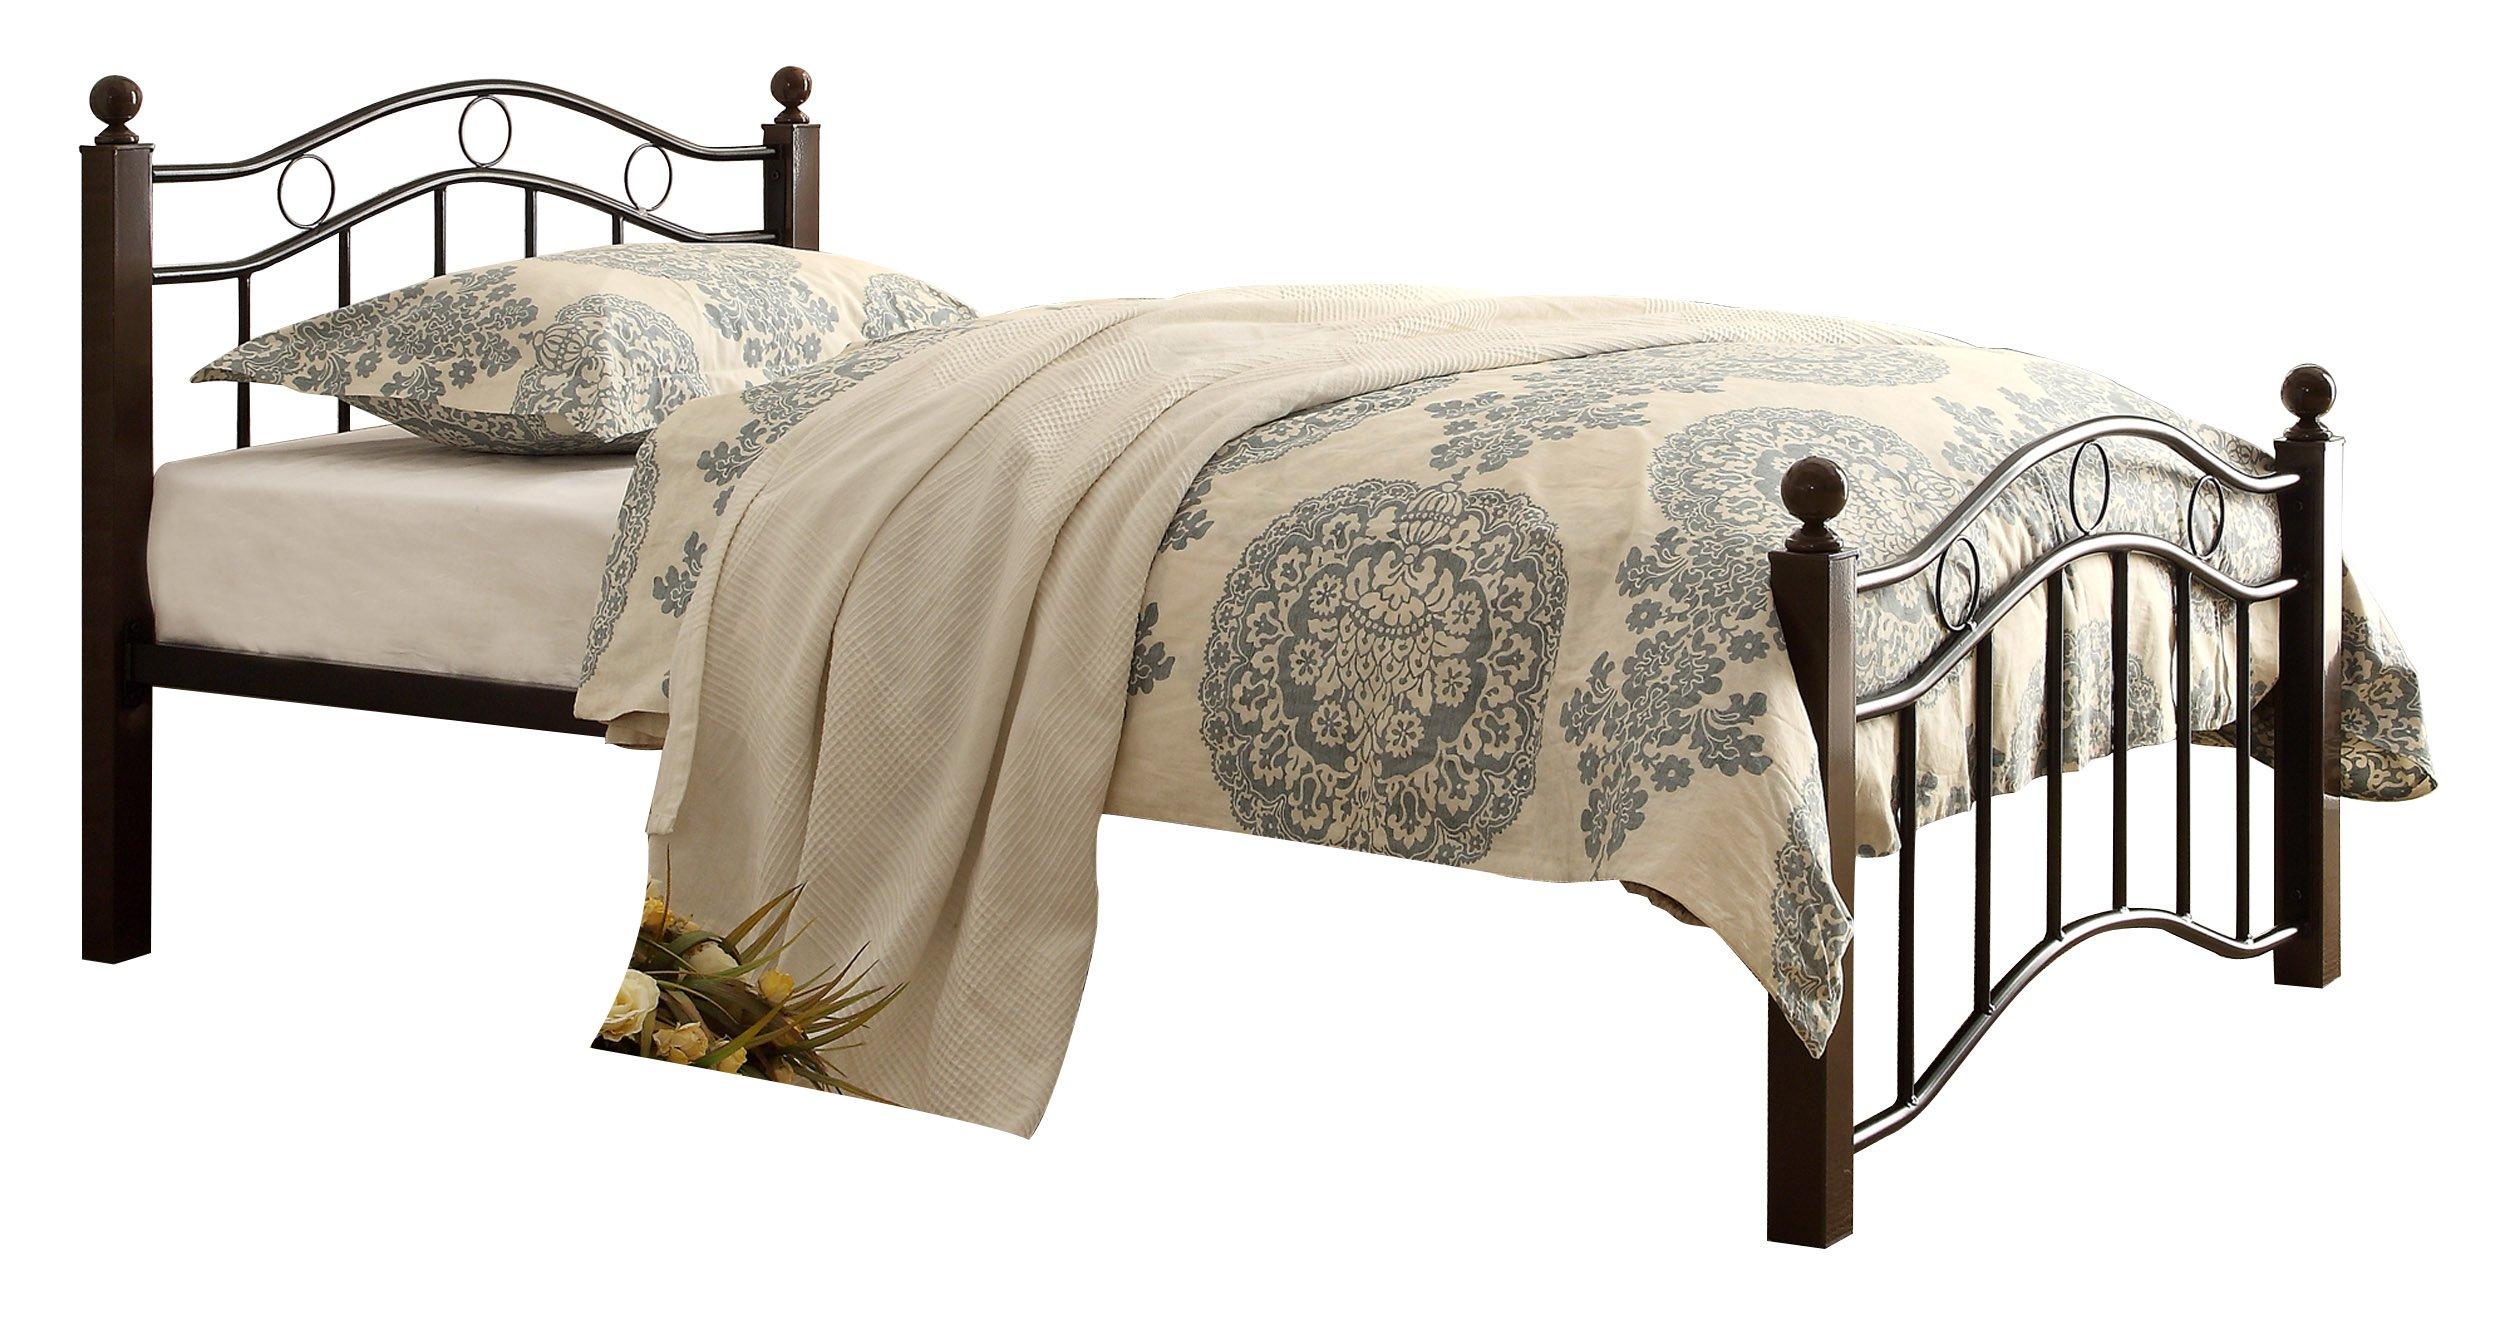 Homelegance 2020TBK-1 Metal Platform Bed, Twin, Black and Brown